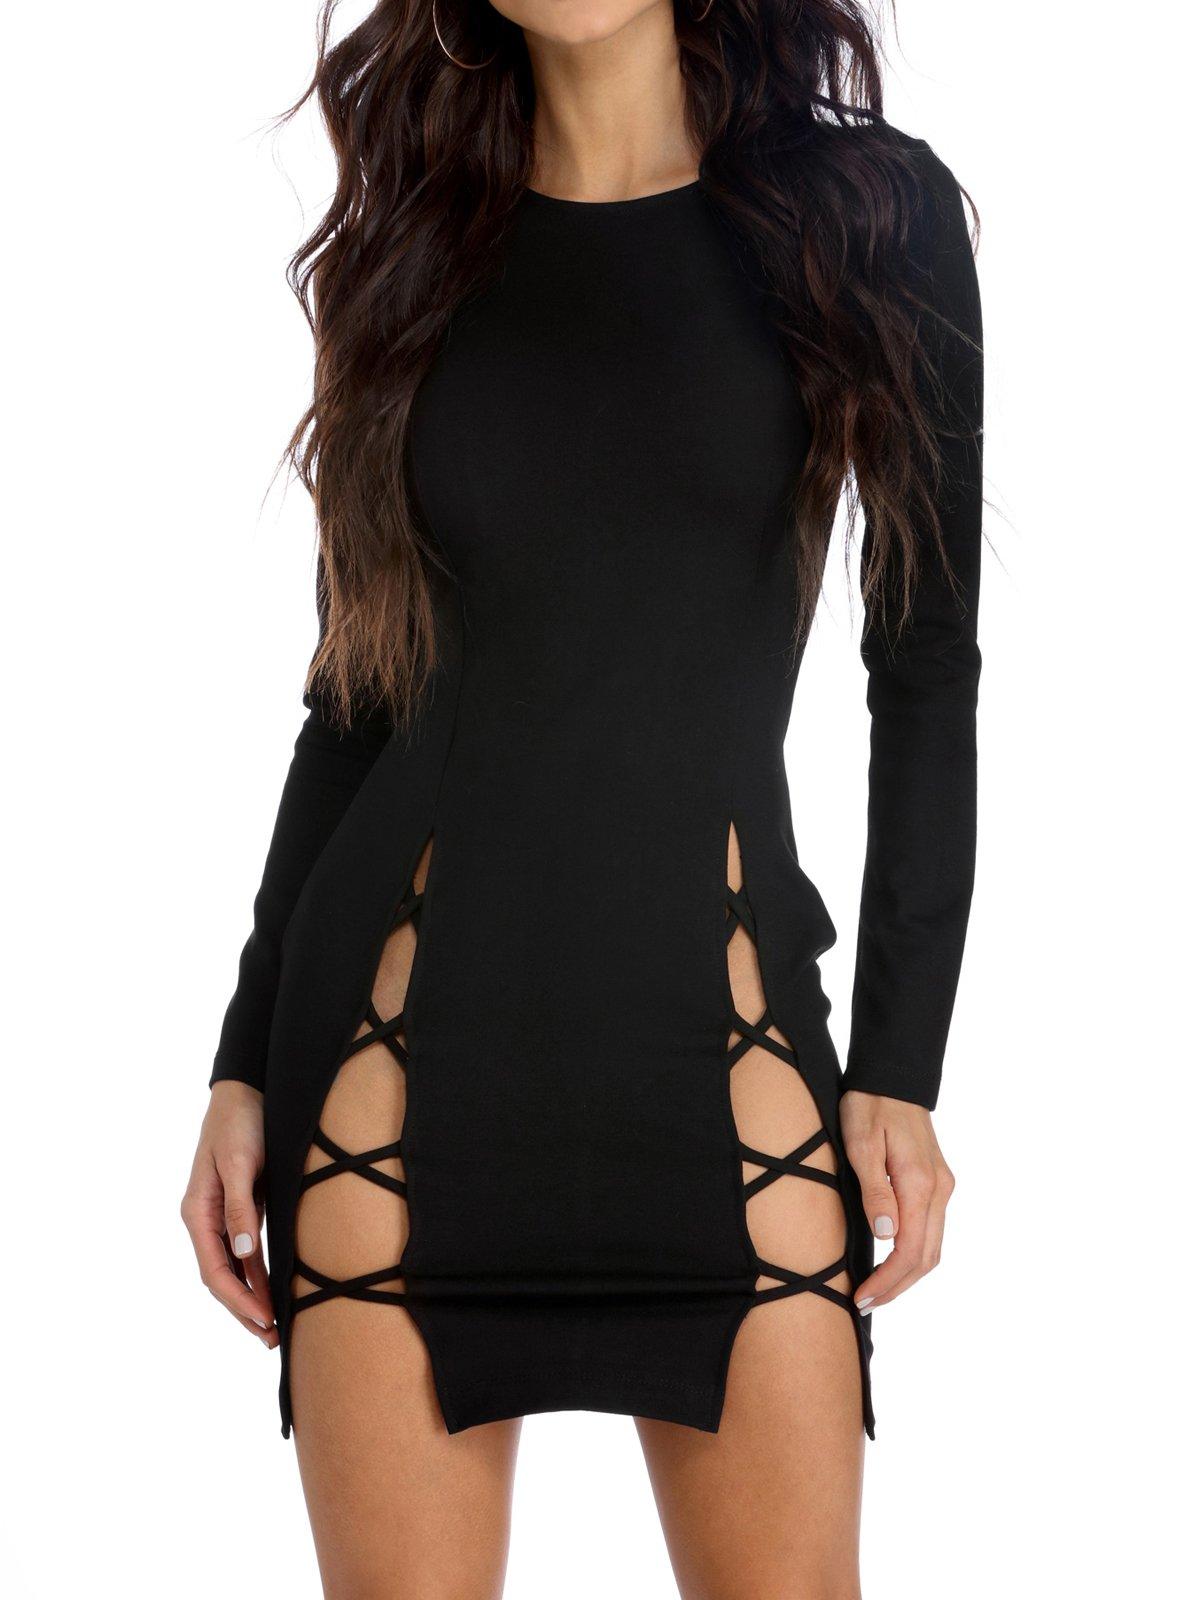 TOB Women's Sexy Summer Bodycon Long Sleeves Lace up Mini Club Dress Black